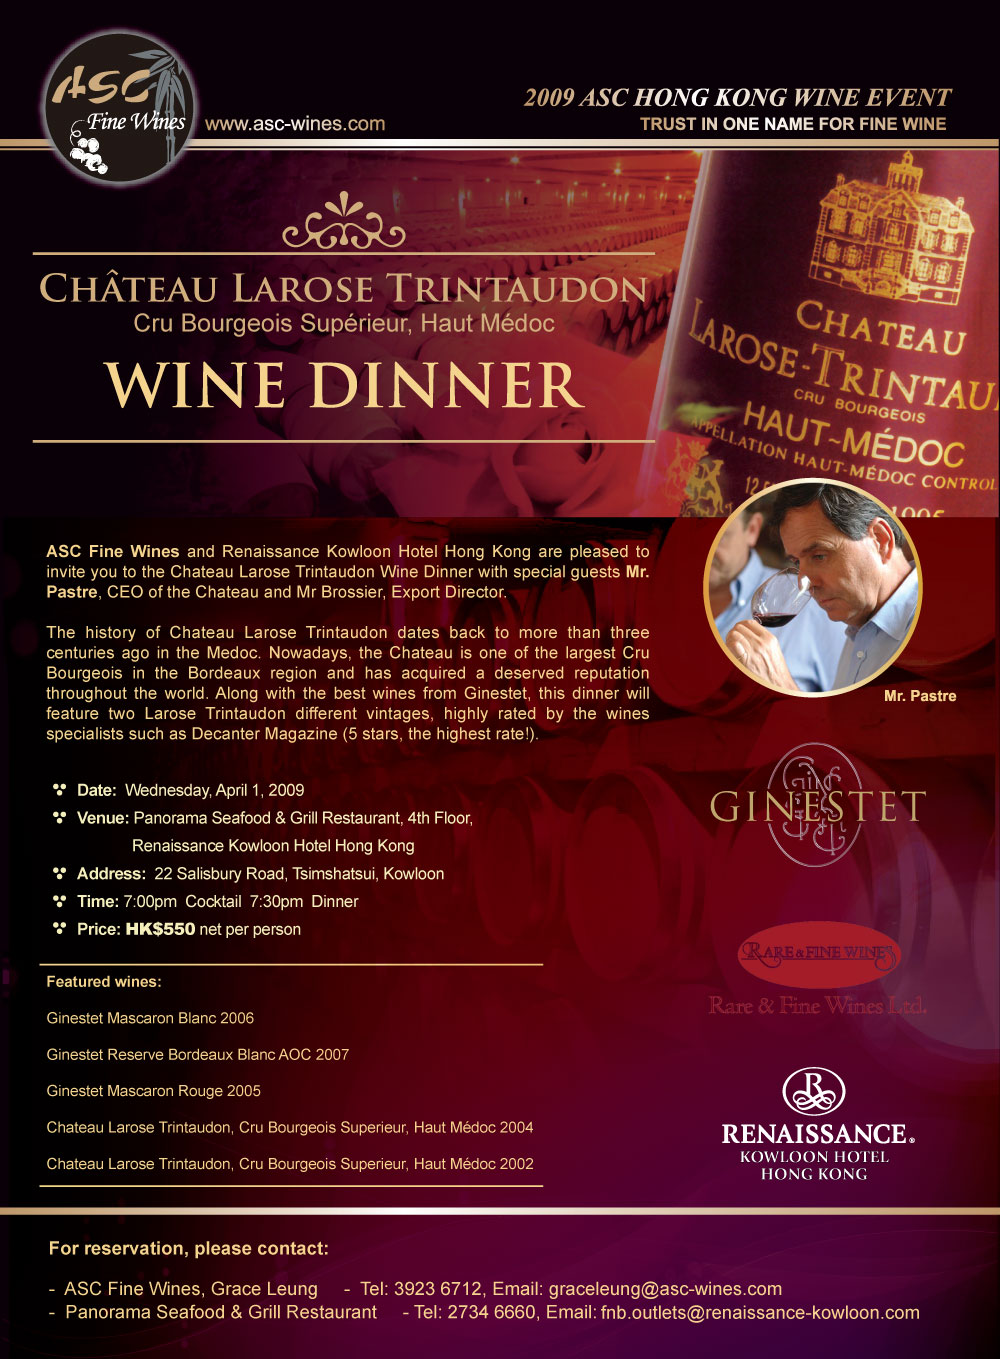 chateau larose trintaudon wine dinner april 1 renaissance kowloon